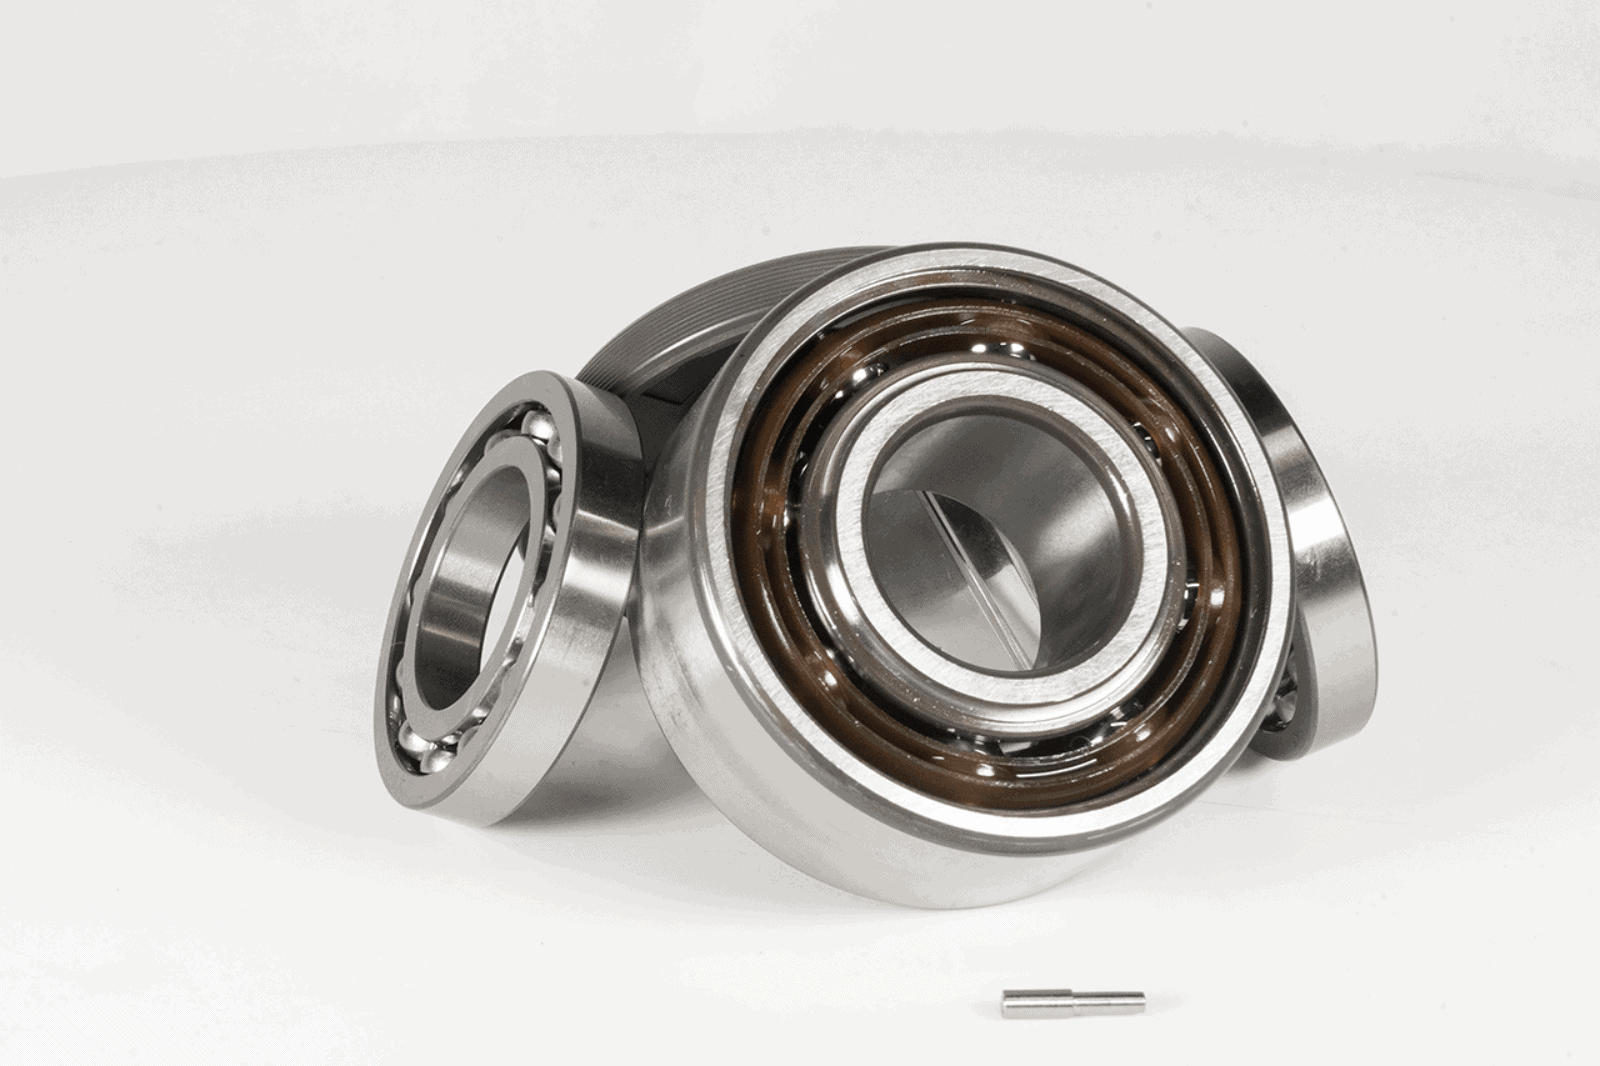 Polaris Rzr Xp 1000 Front Differential Bearing & Seal Kit